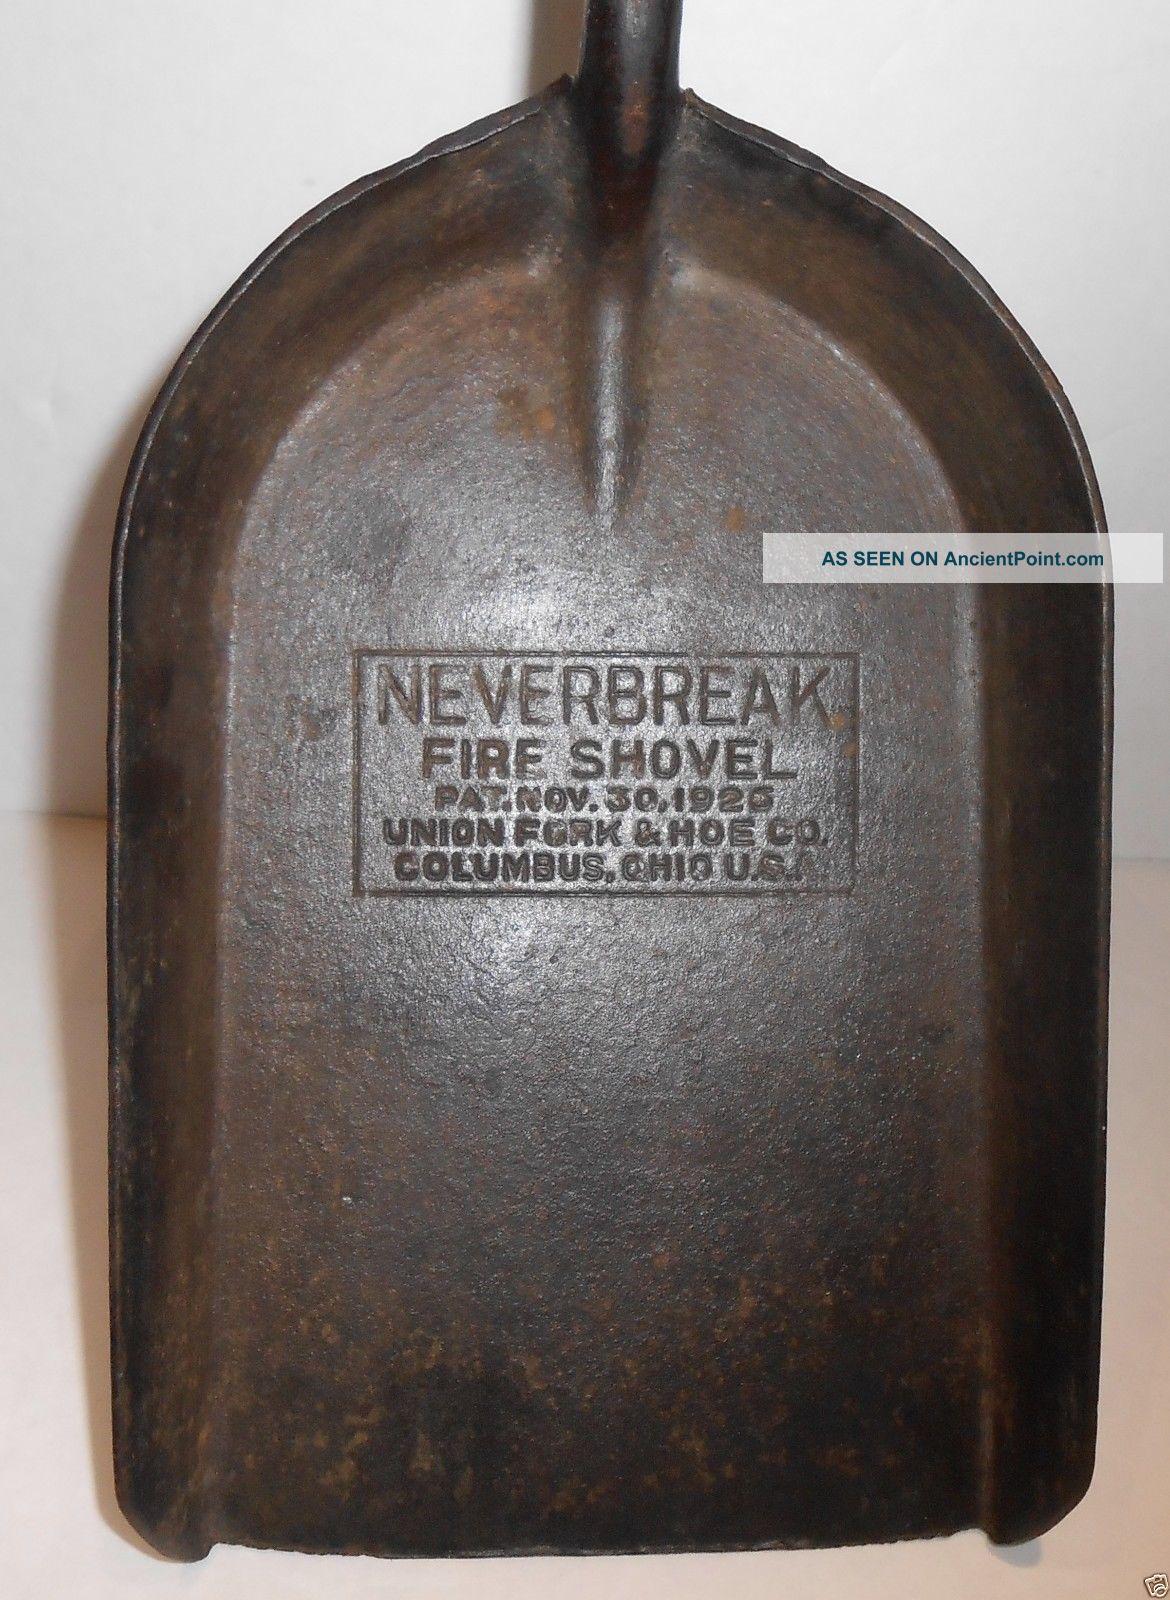 1926 Neverbreak Forged Steel Fire Shovel By Union Fork & Hoe Co. Hearth Ware photo